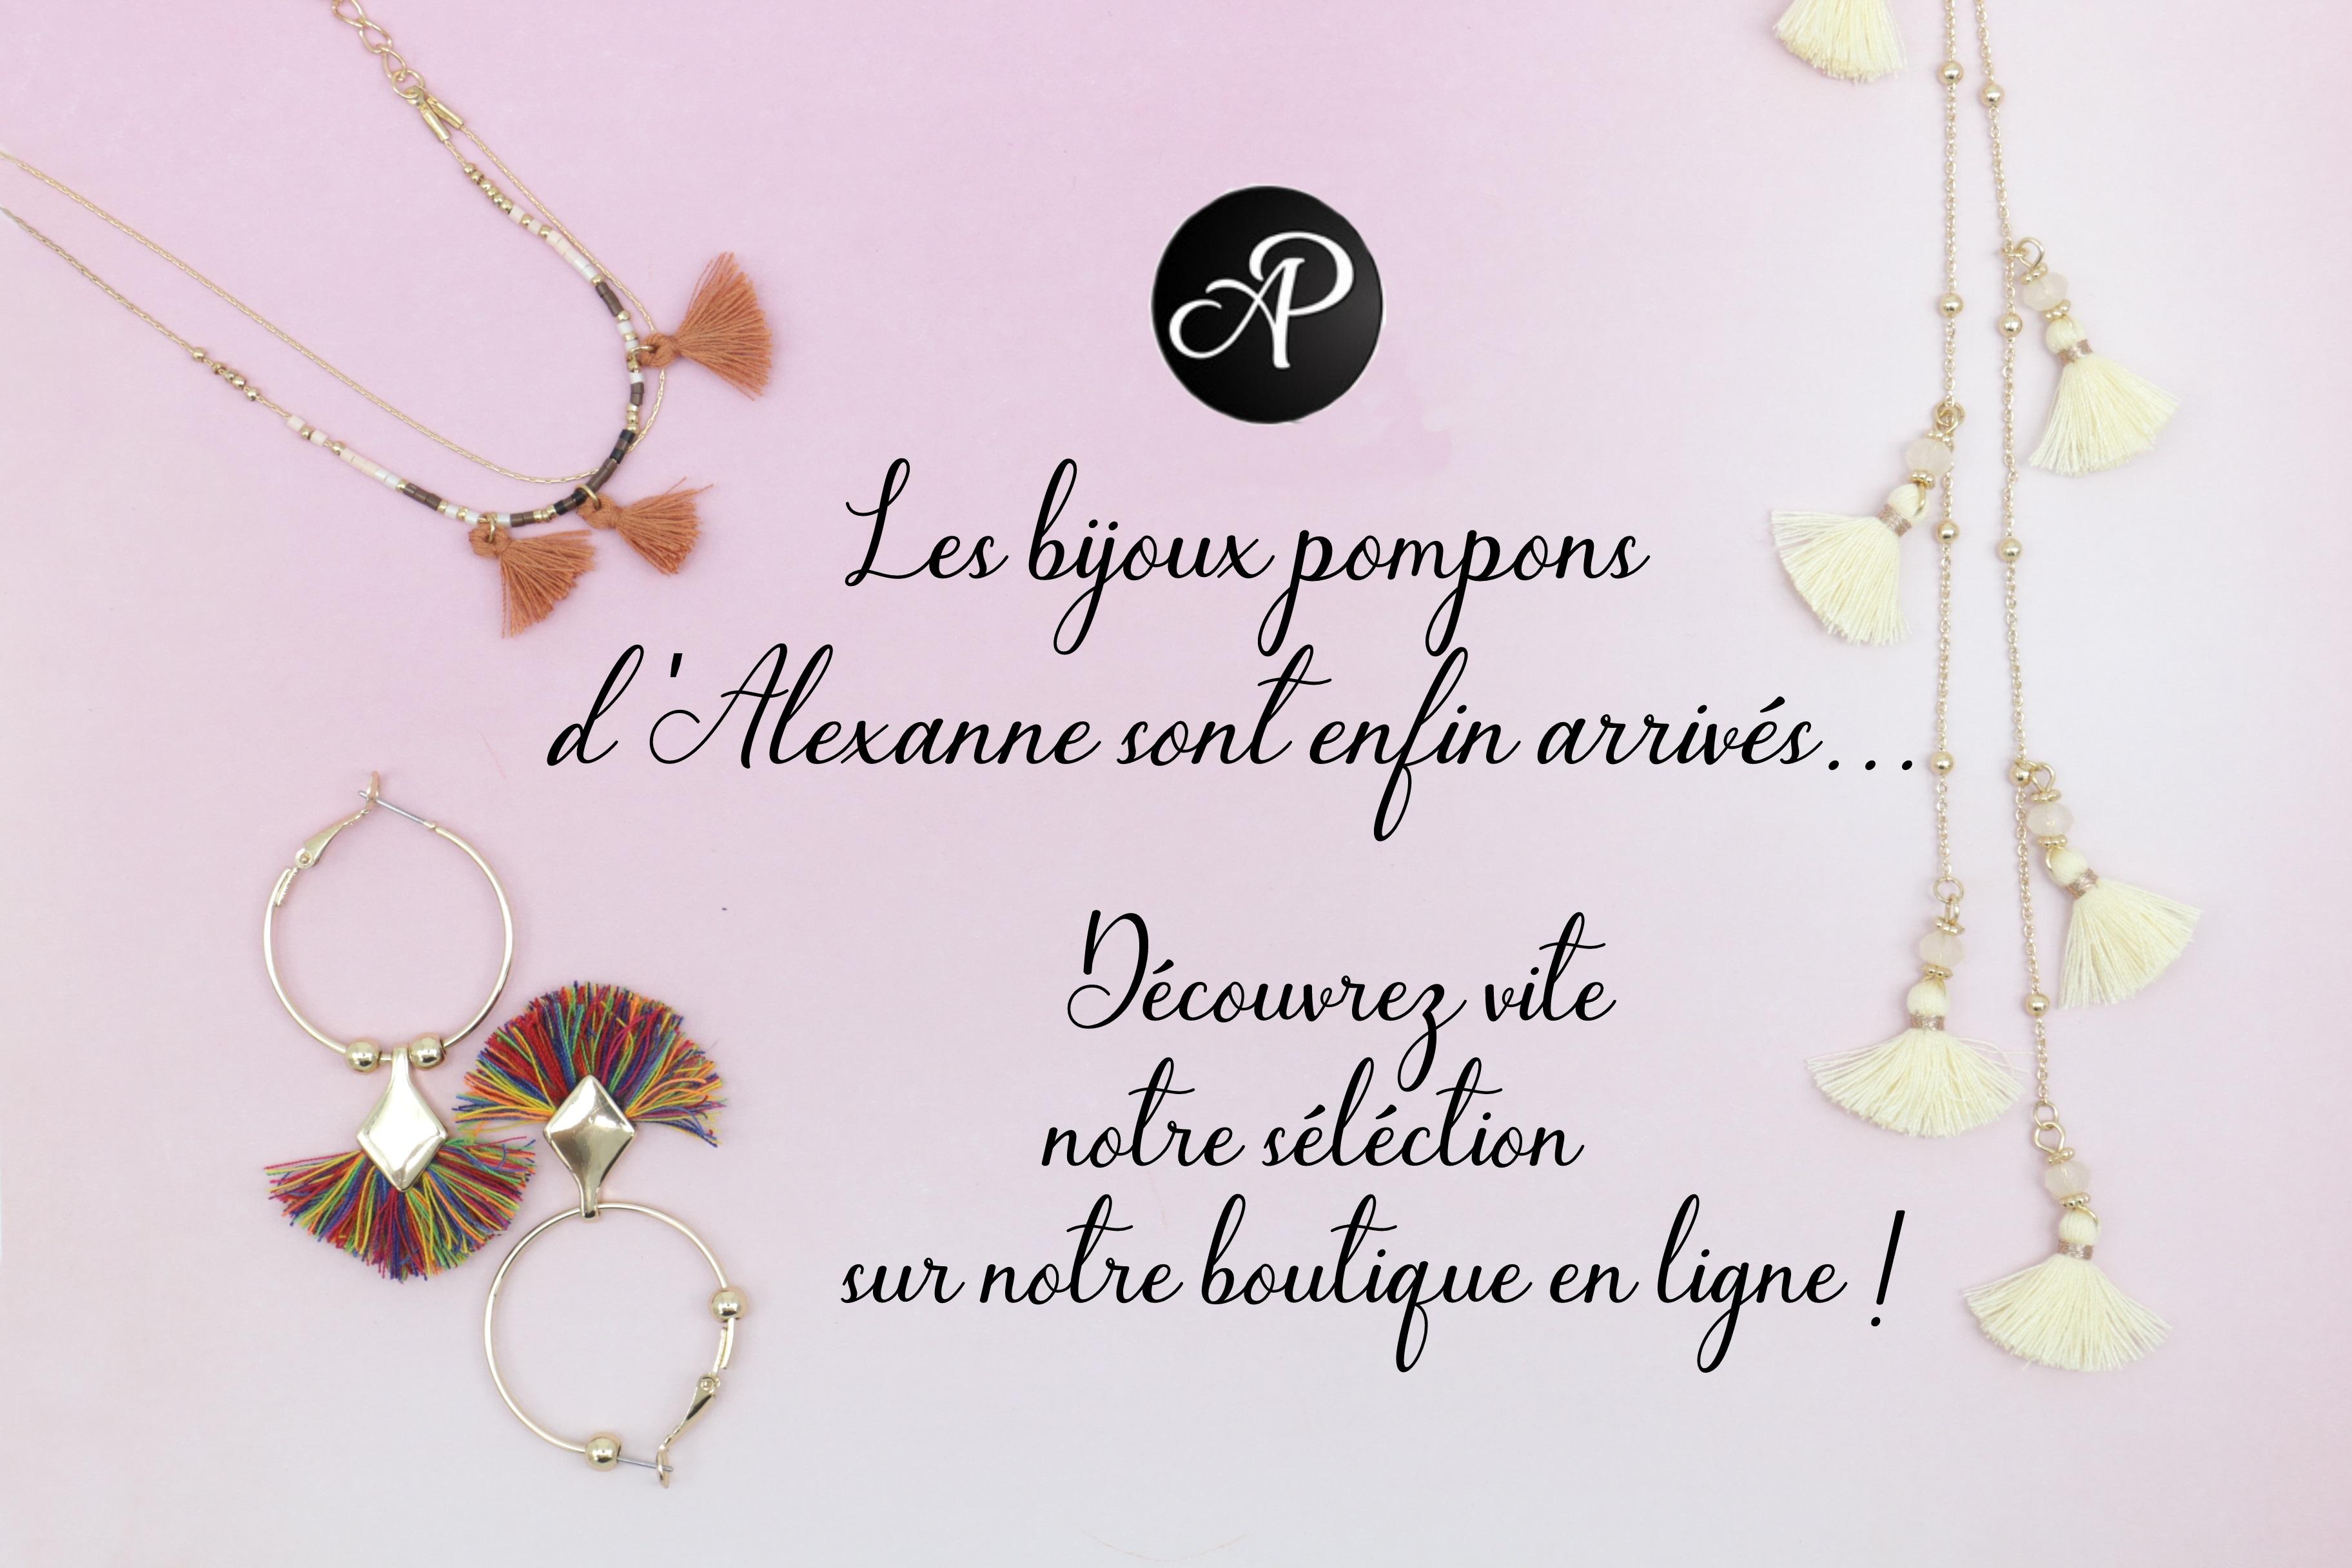 Alexanne bijoux pompon